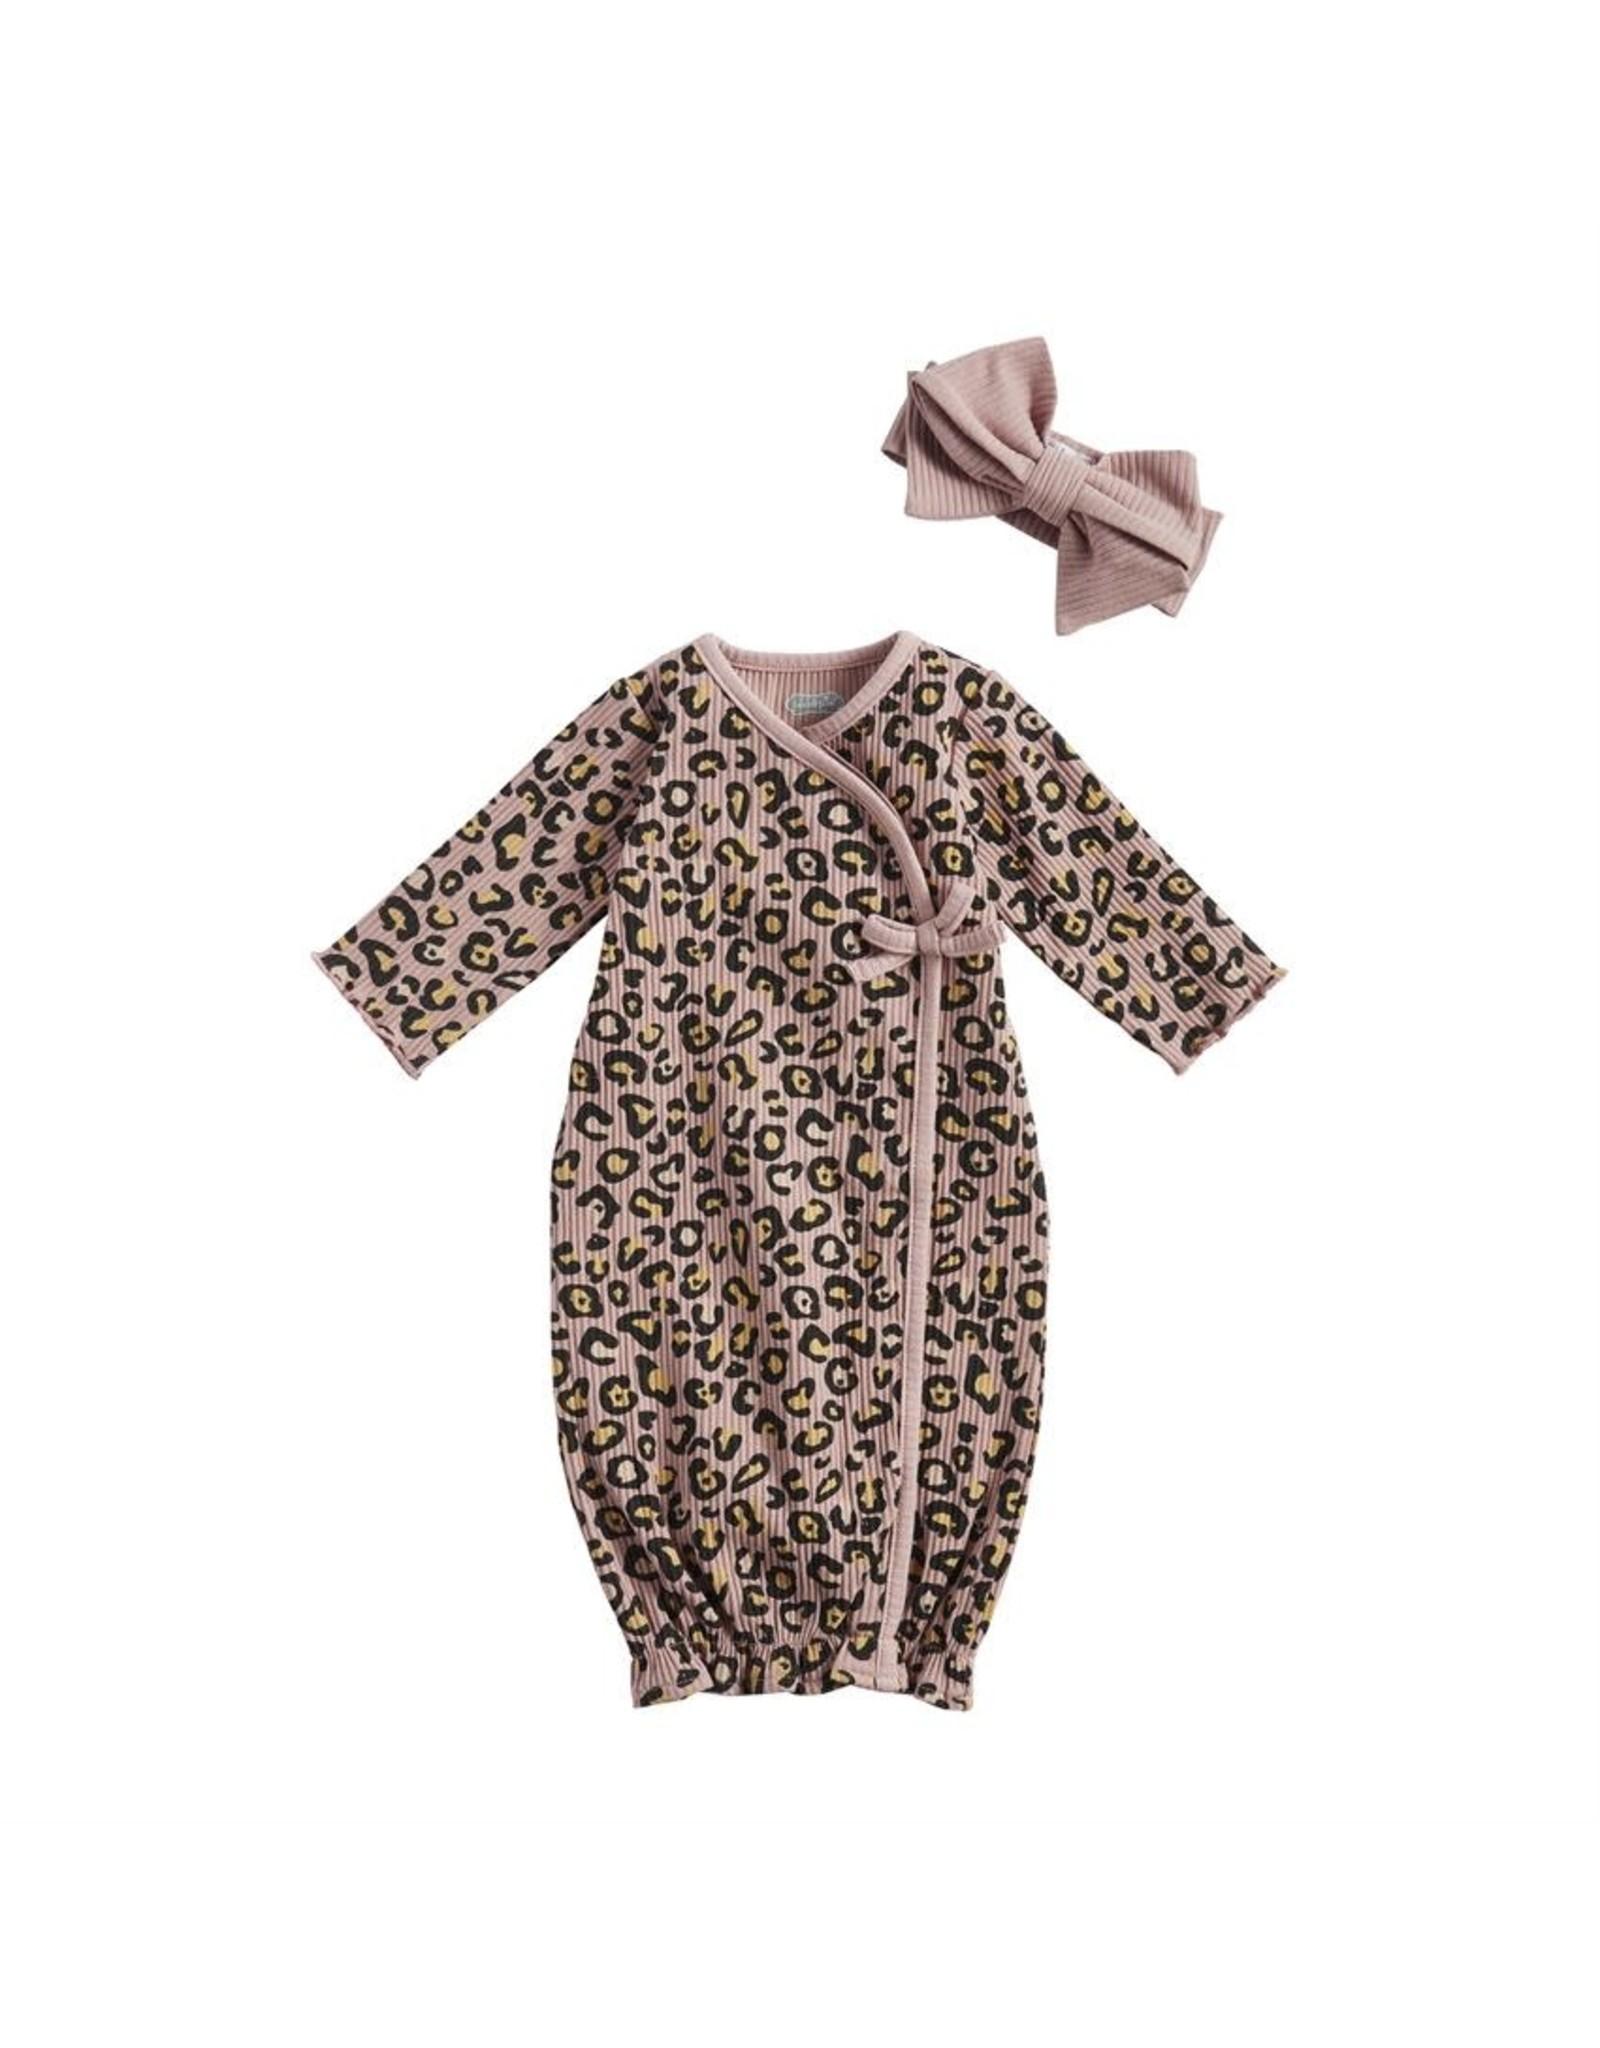 Mudpie Mud Pie- Mauve Leopard Gown & Headband Set 0-3M